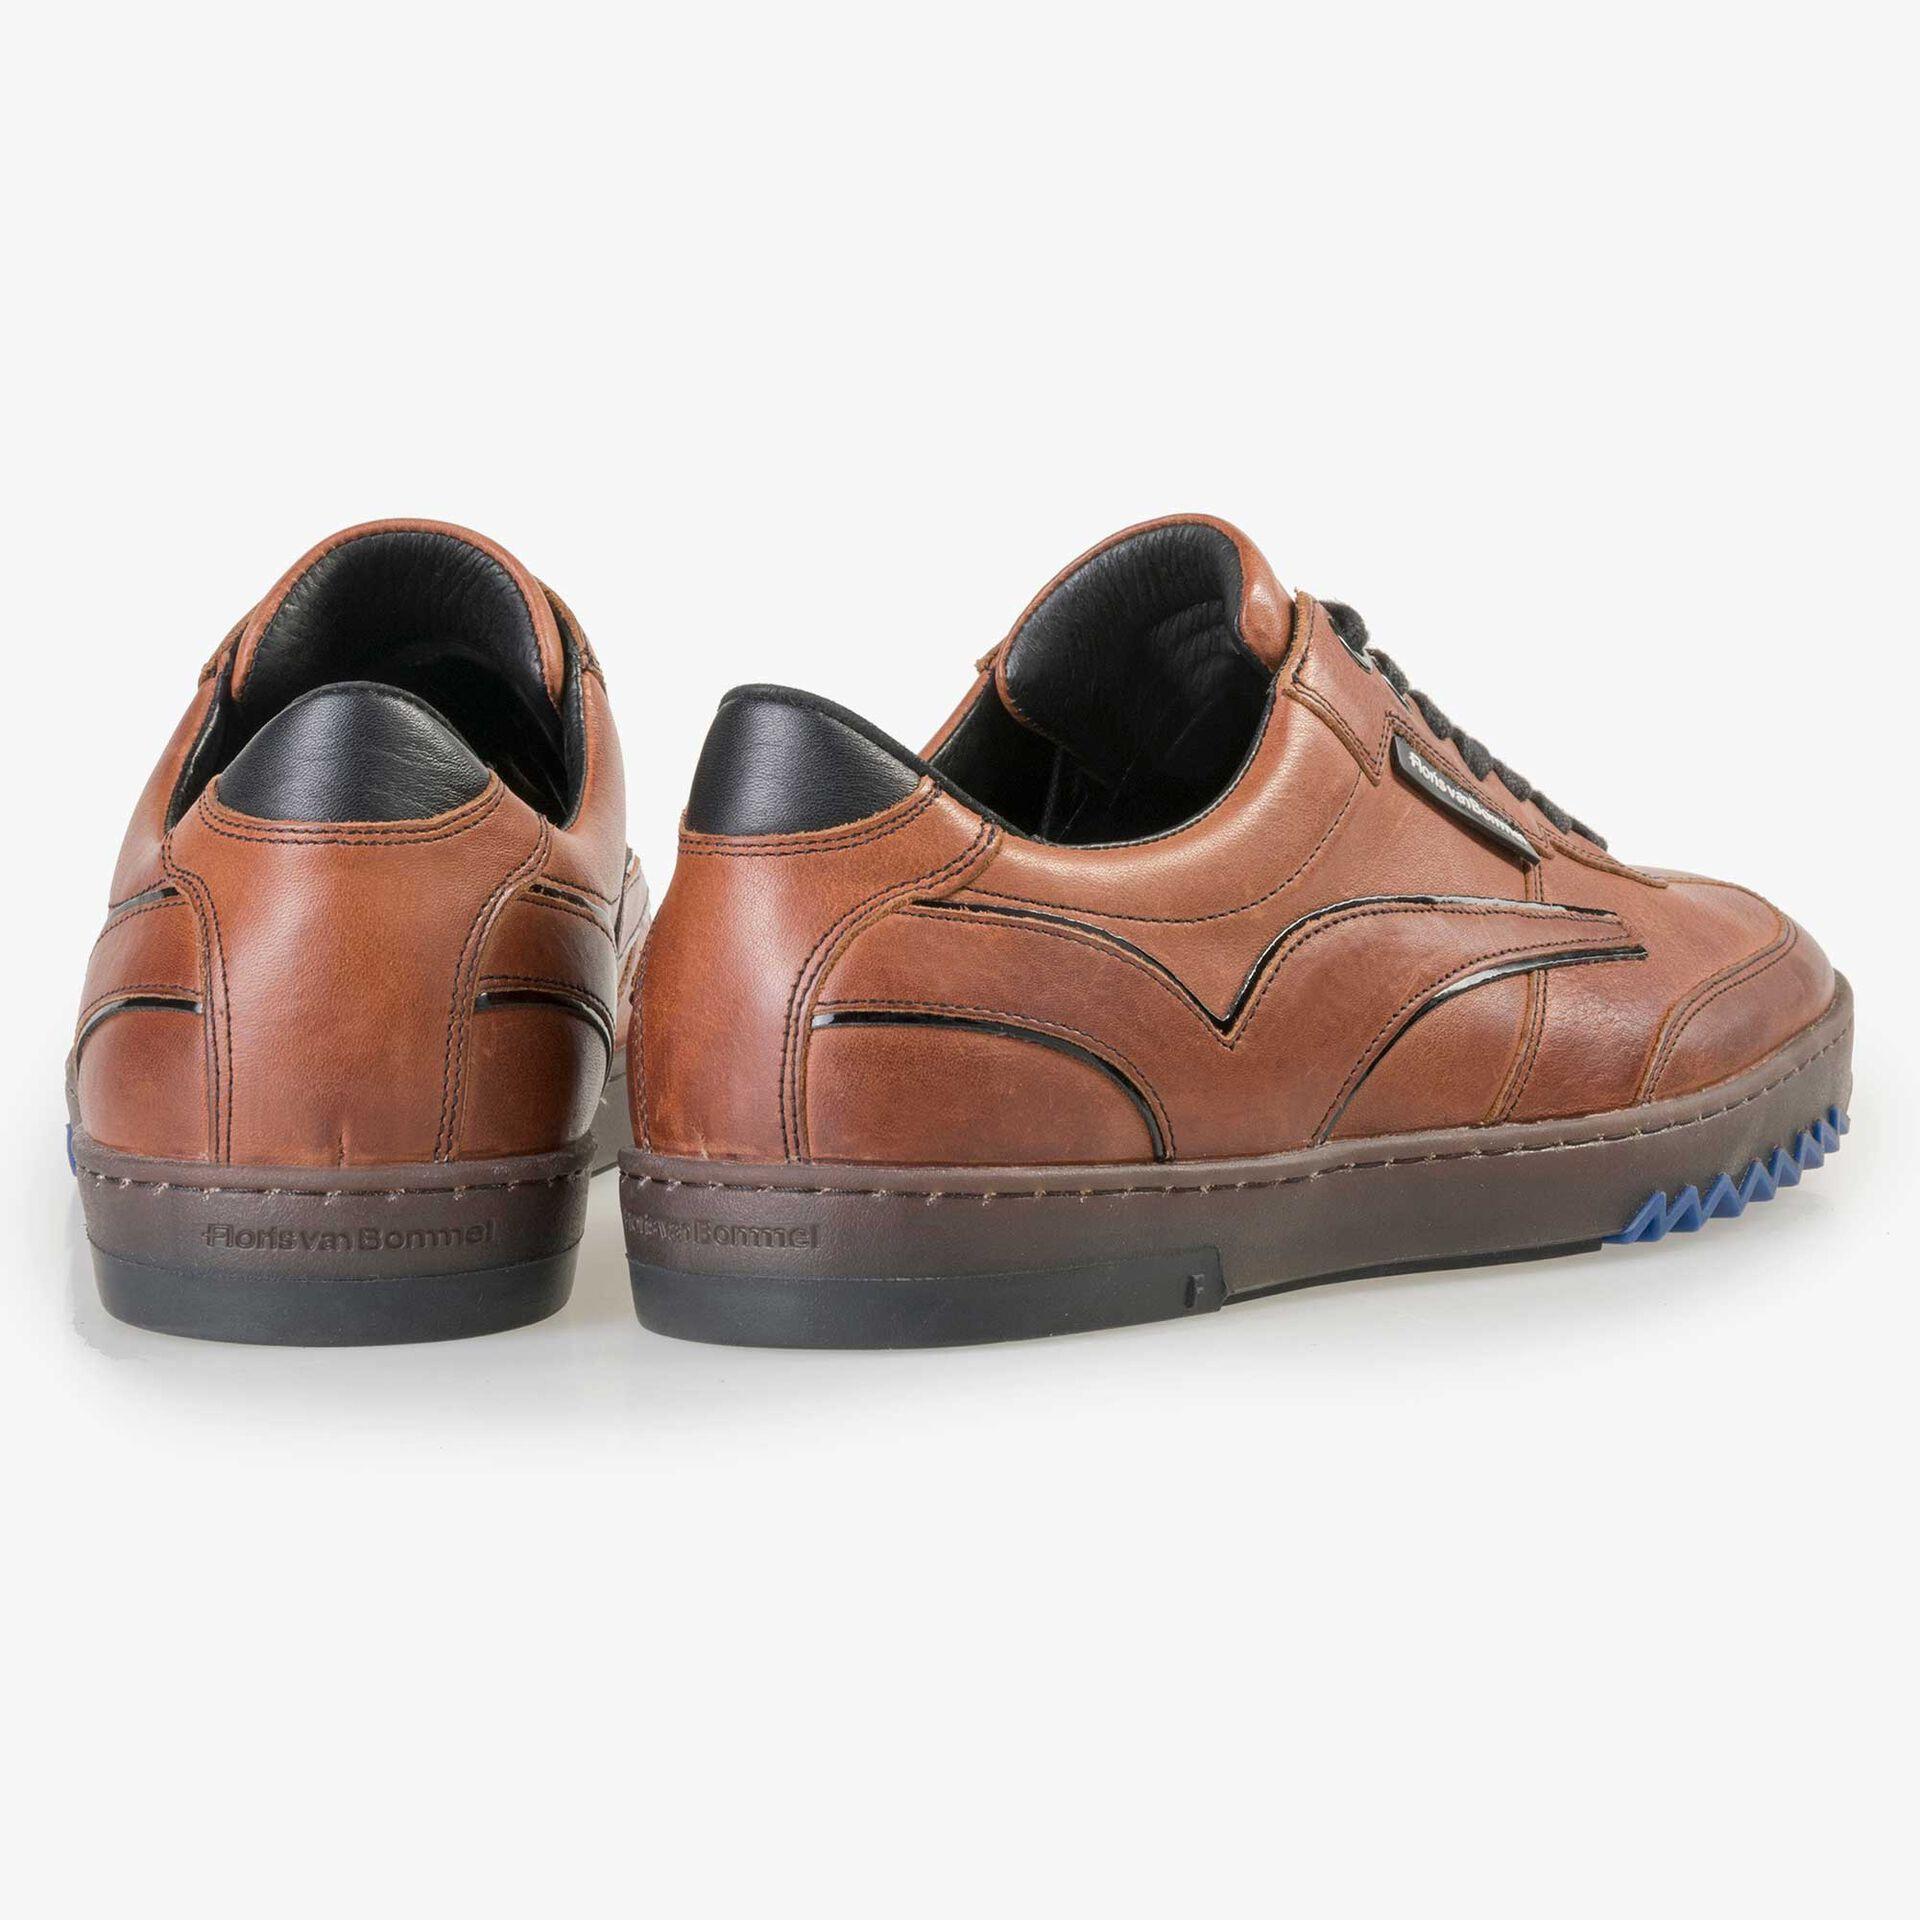 Floris van Bommel men's cognac-coloured leather sneaker